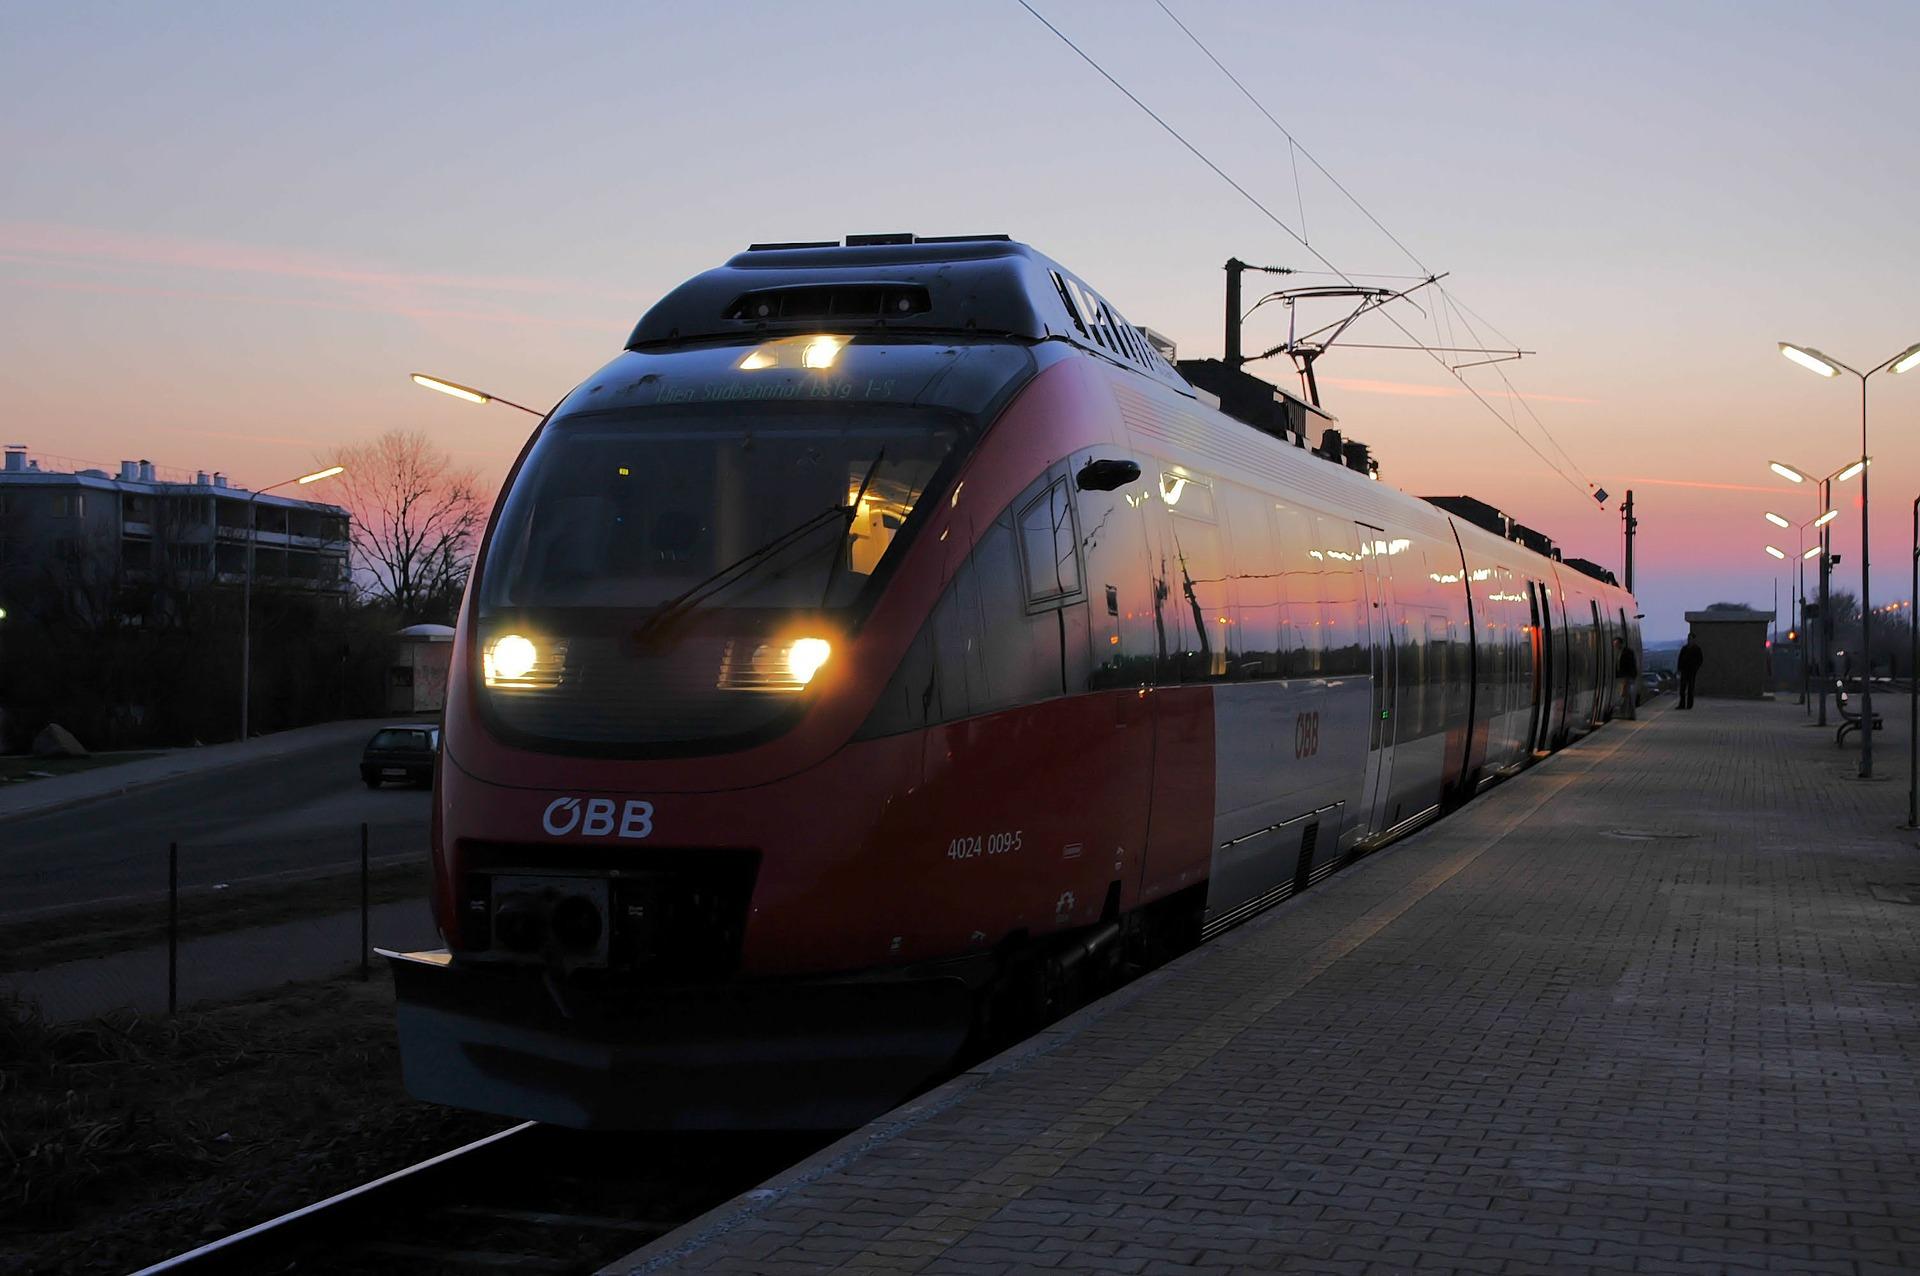 railway-140967_1920